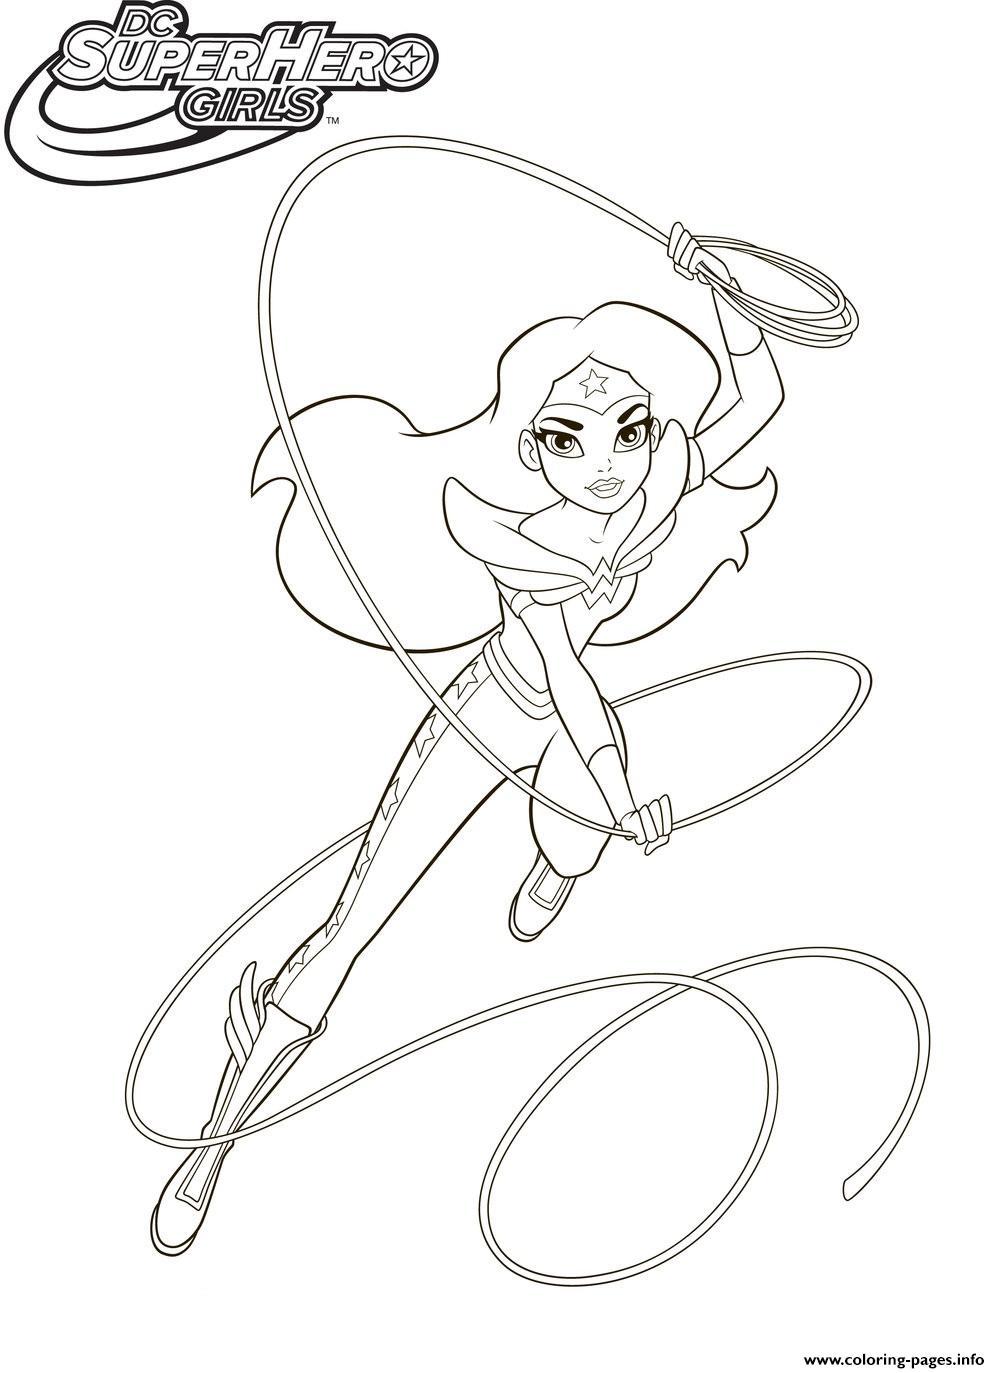 Wonderwoman Super Hero Girls Coloring Pages Printable